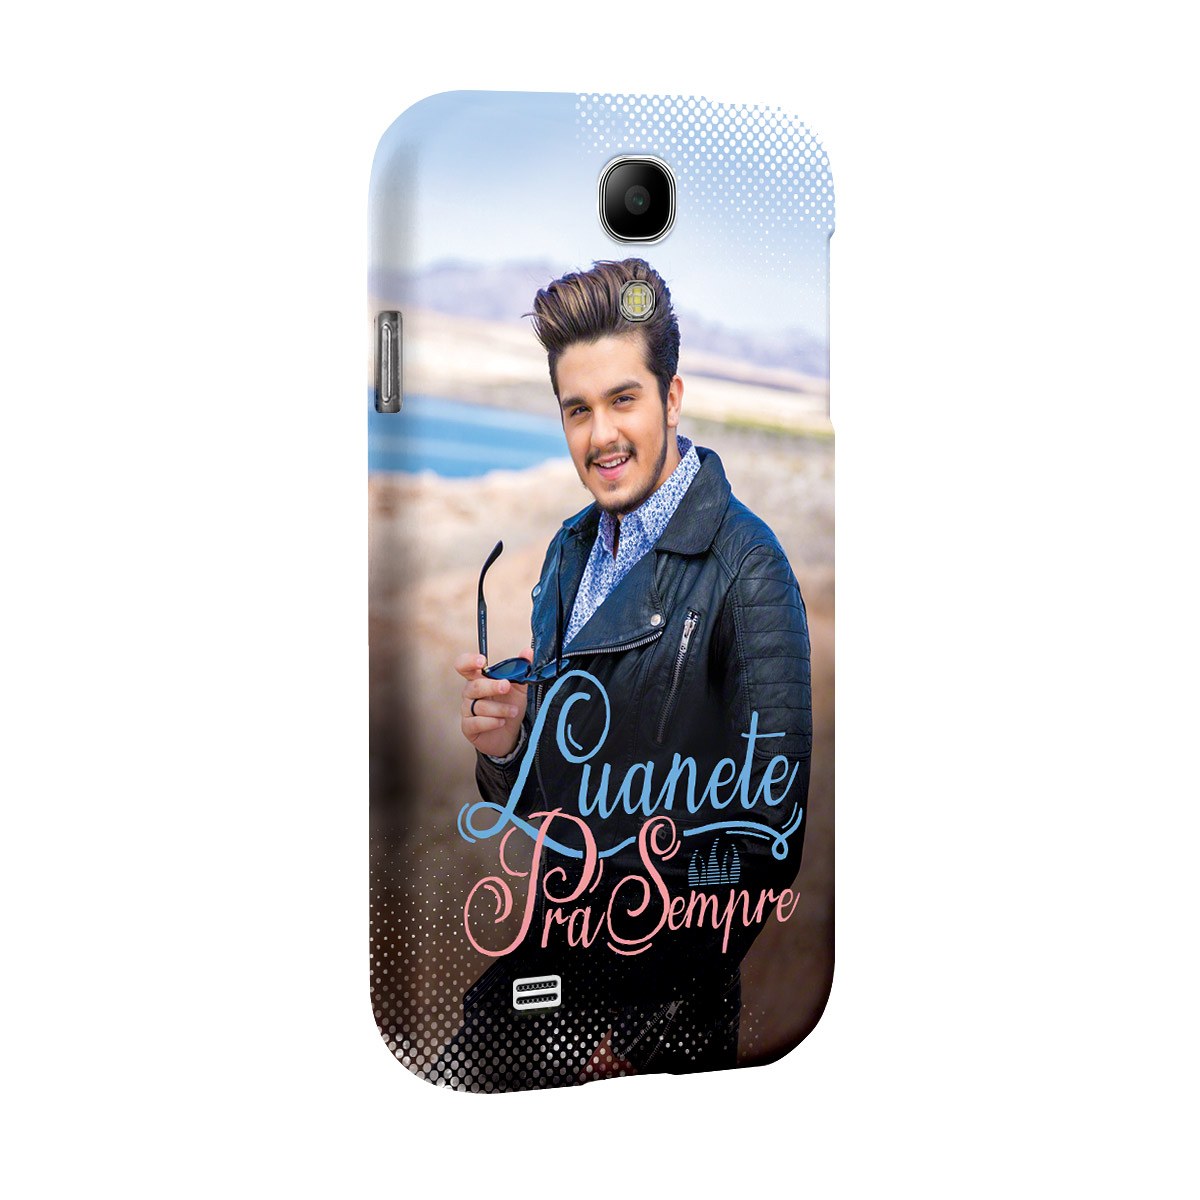 Capa para Samsung S4 Luan Santana Luanete Pra Sempre